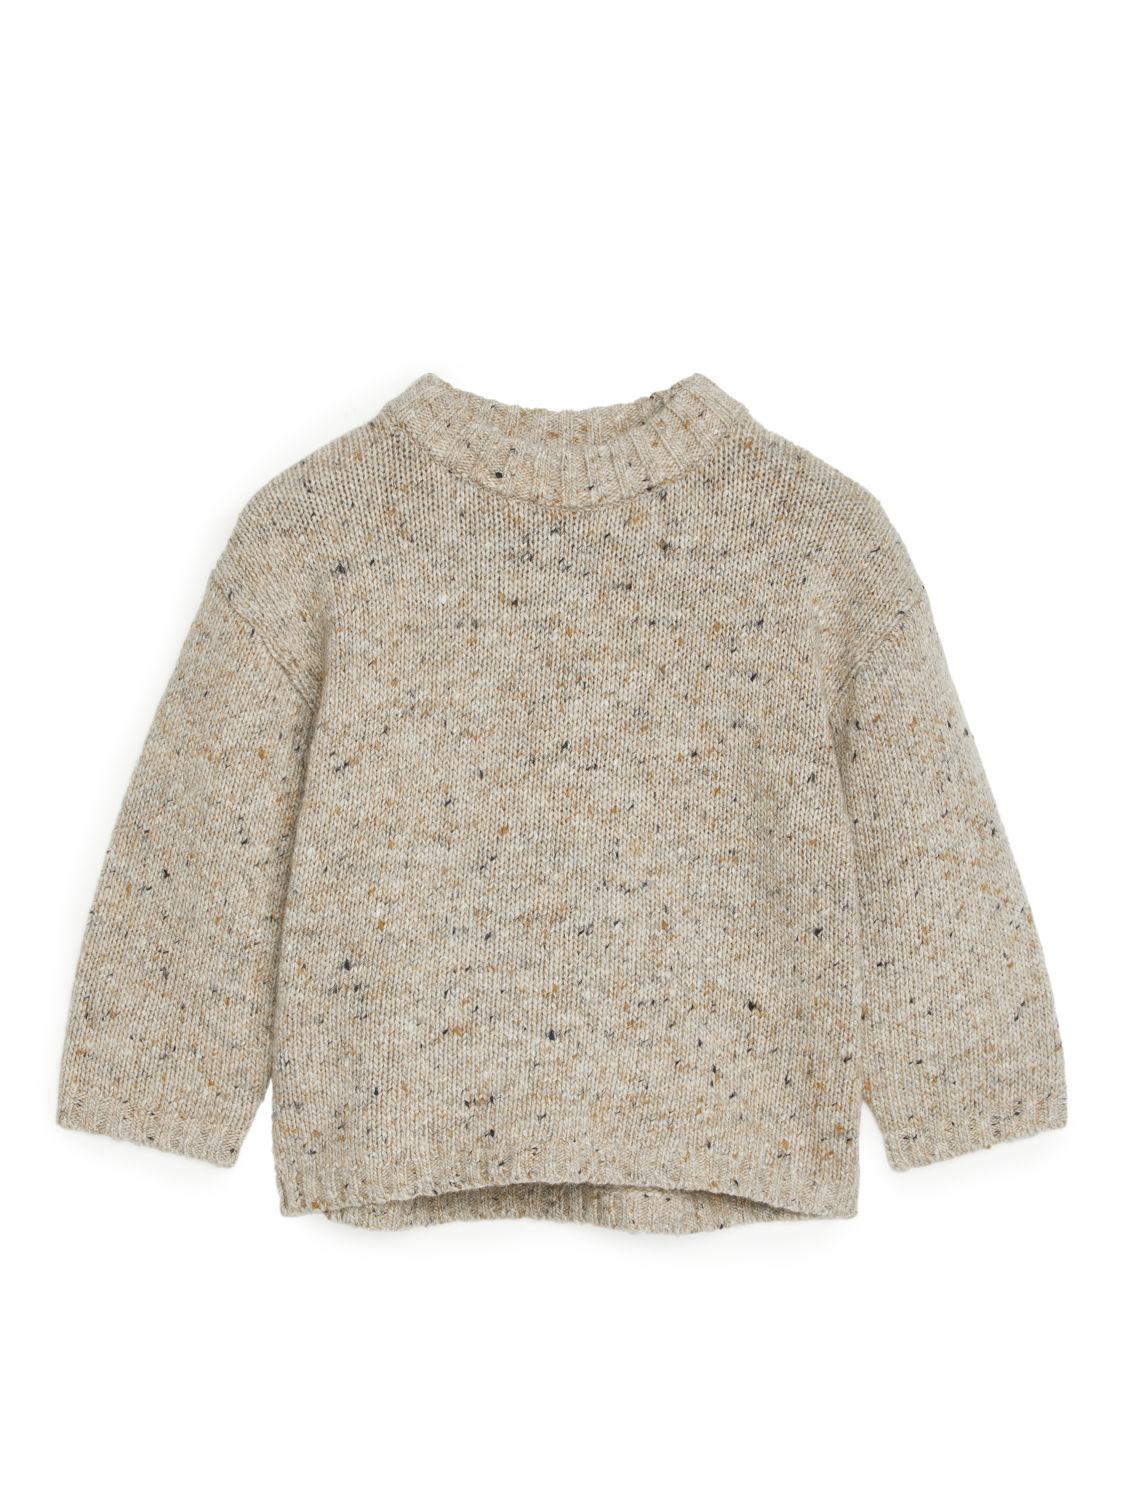 Beige wool jumper